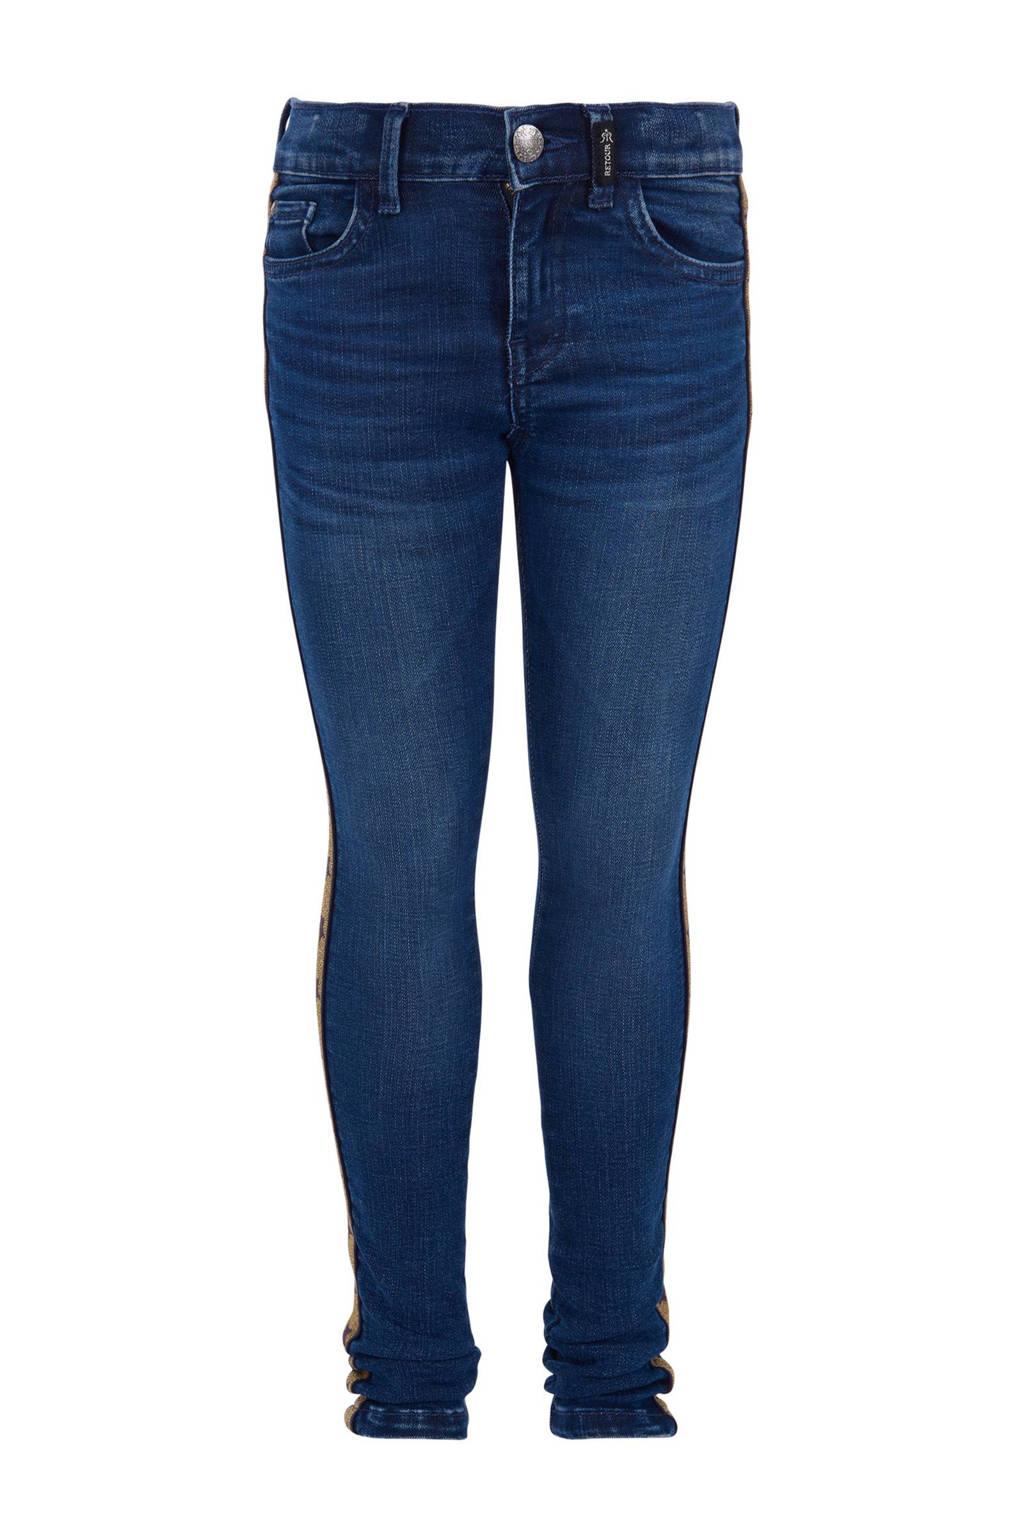 Retour Denim skinny jeans Truus, Donkerblauw